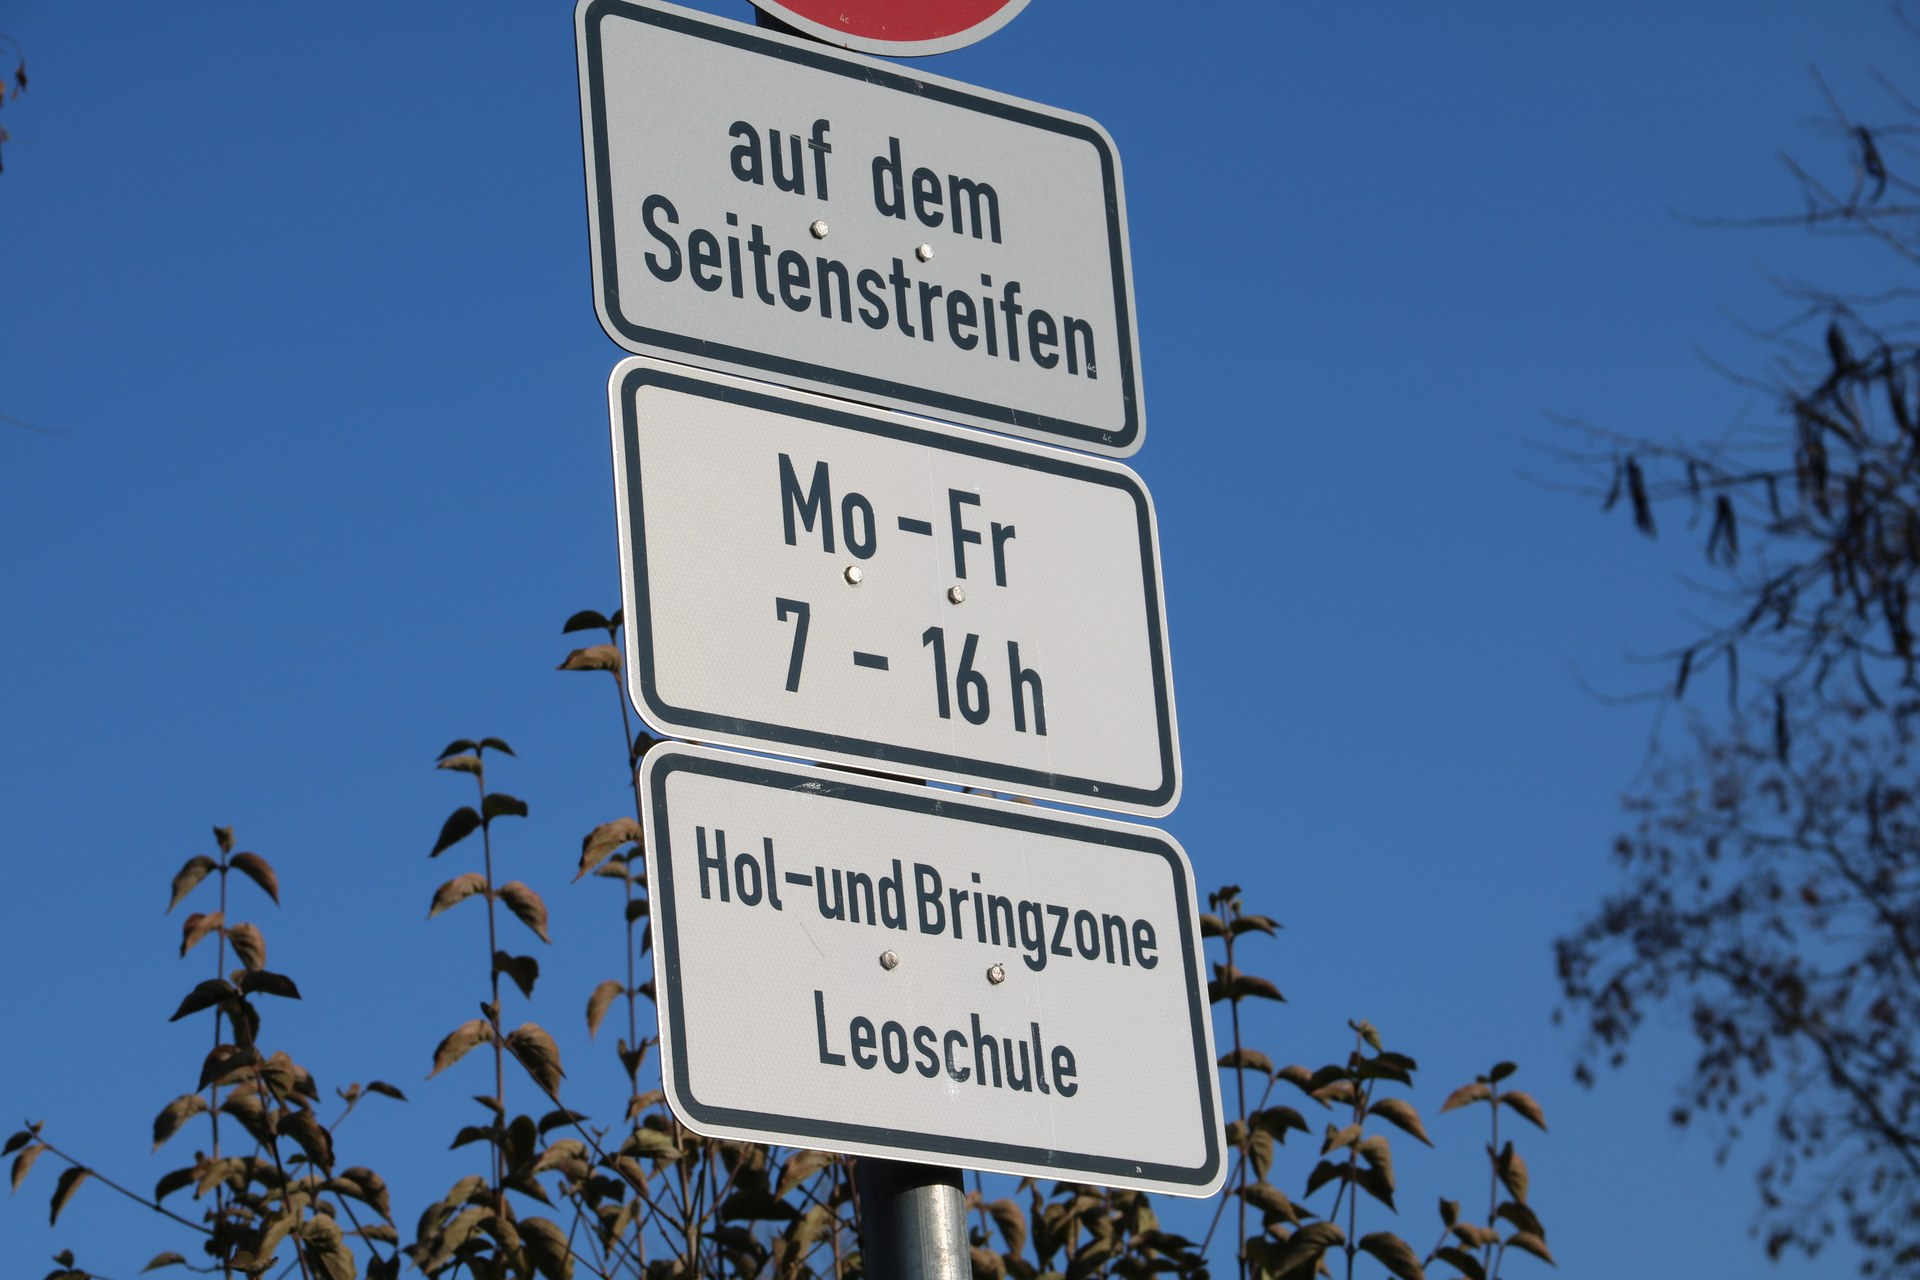 Hol- und Bringzone Leoschule.JPG